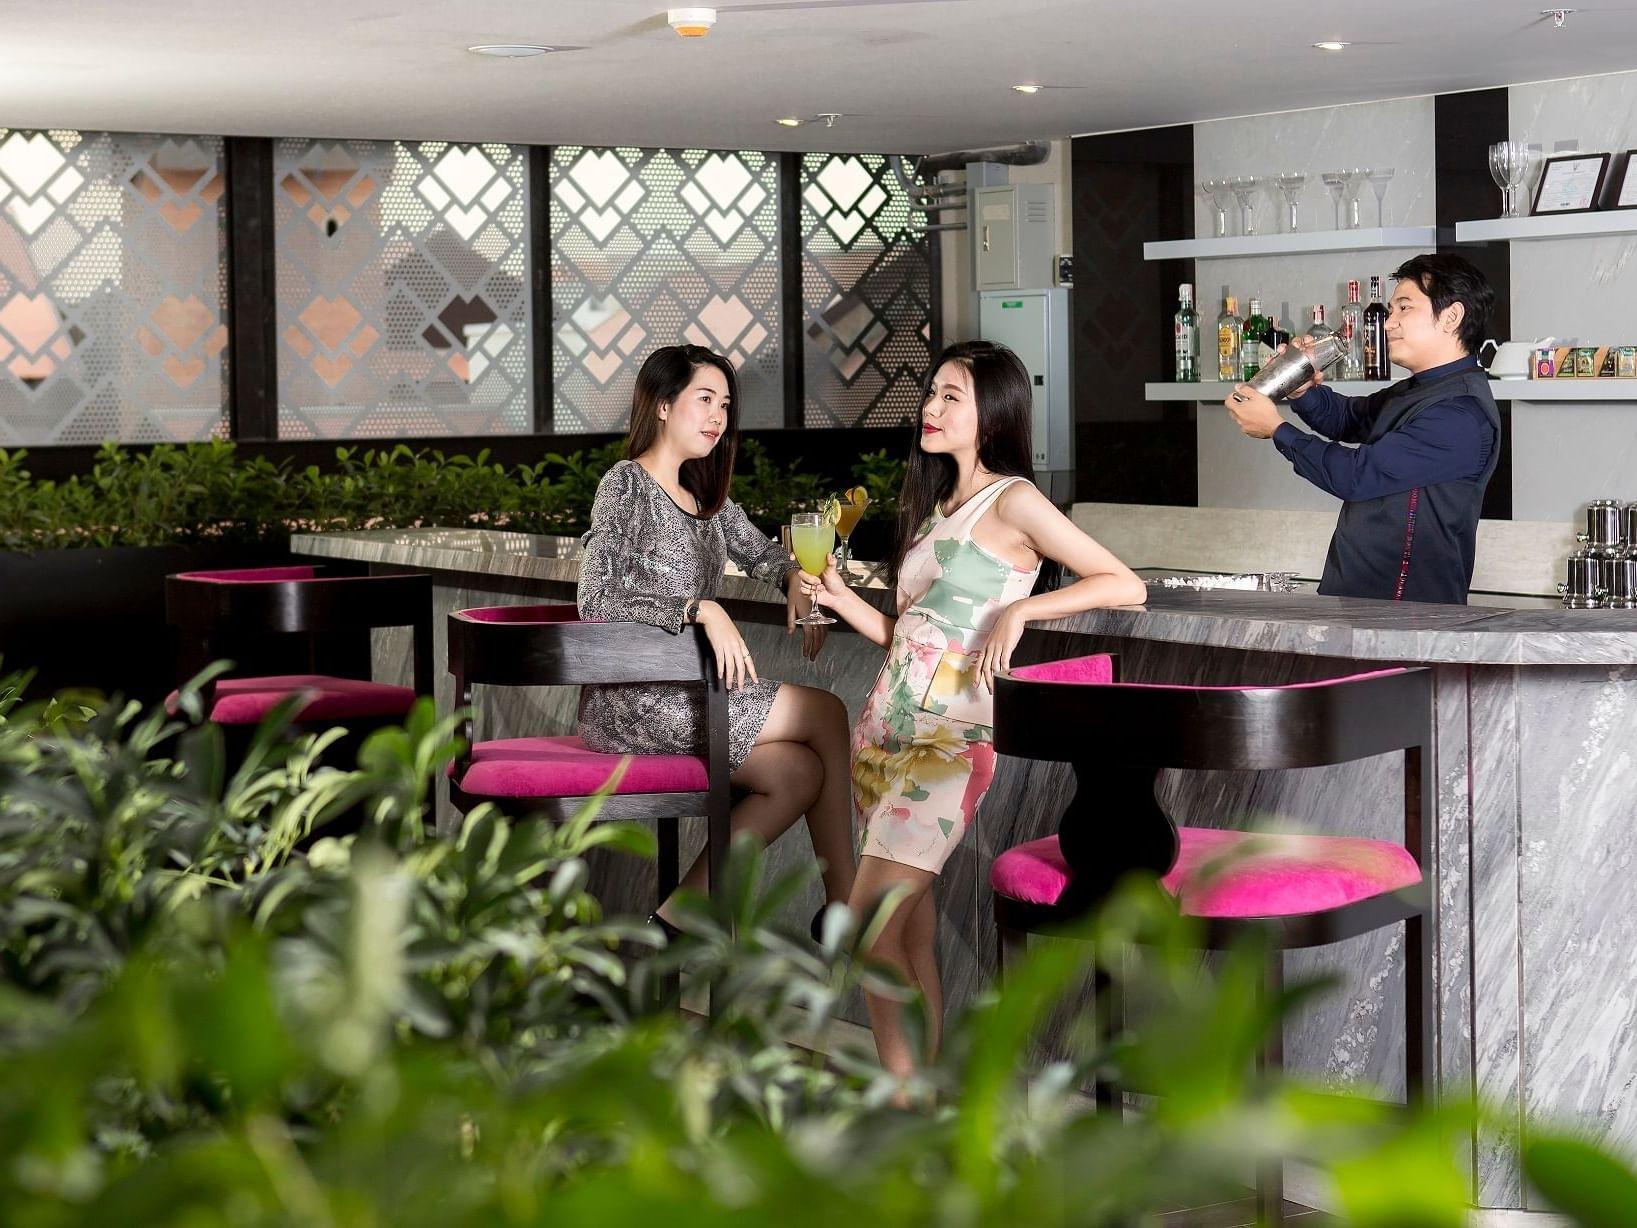 Splash Pool Bar at U Hotels and Resorts